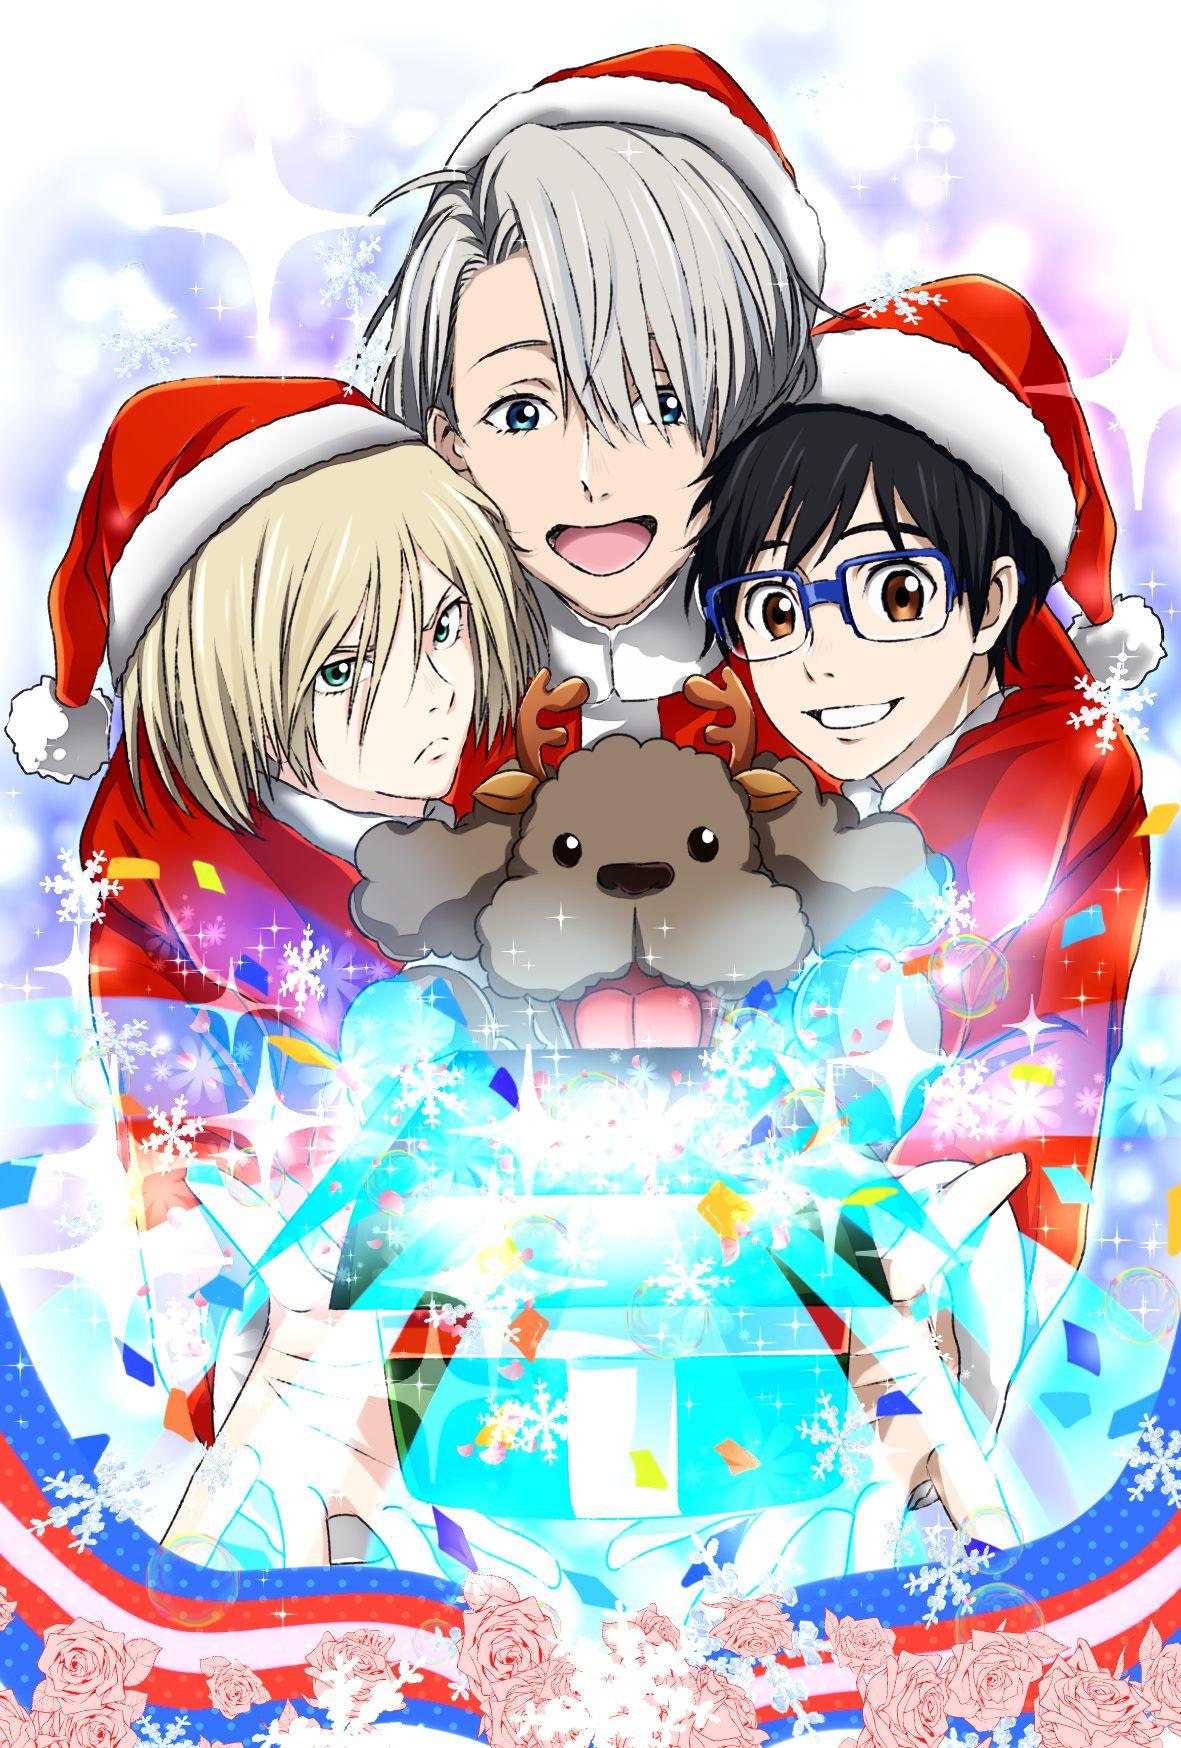 Yuri!!! on Ice No christmas but I poste this xd | Yuri On Ice ...